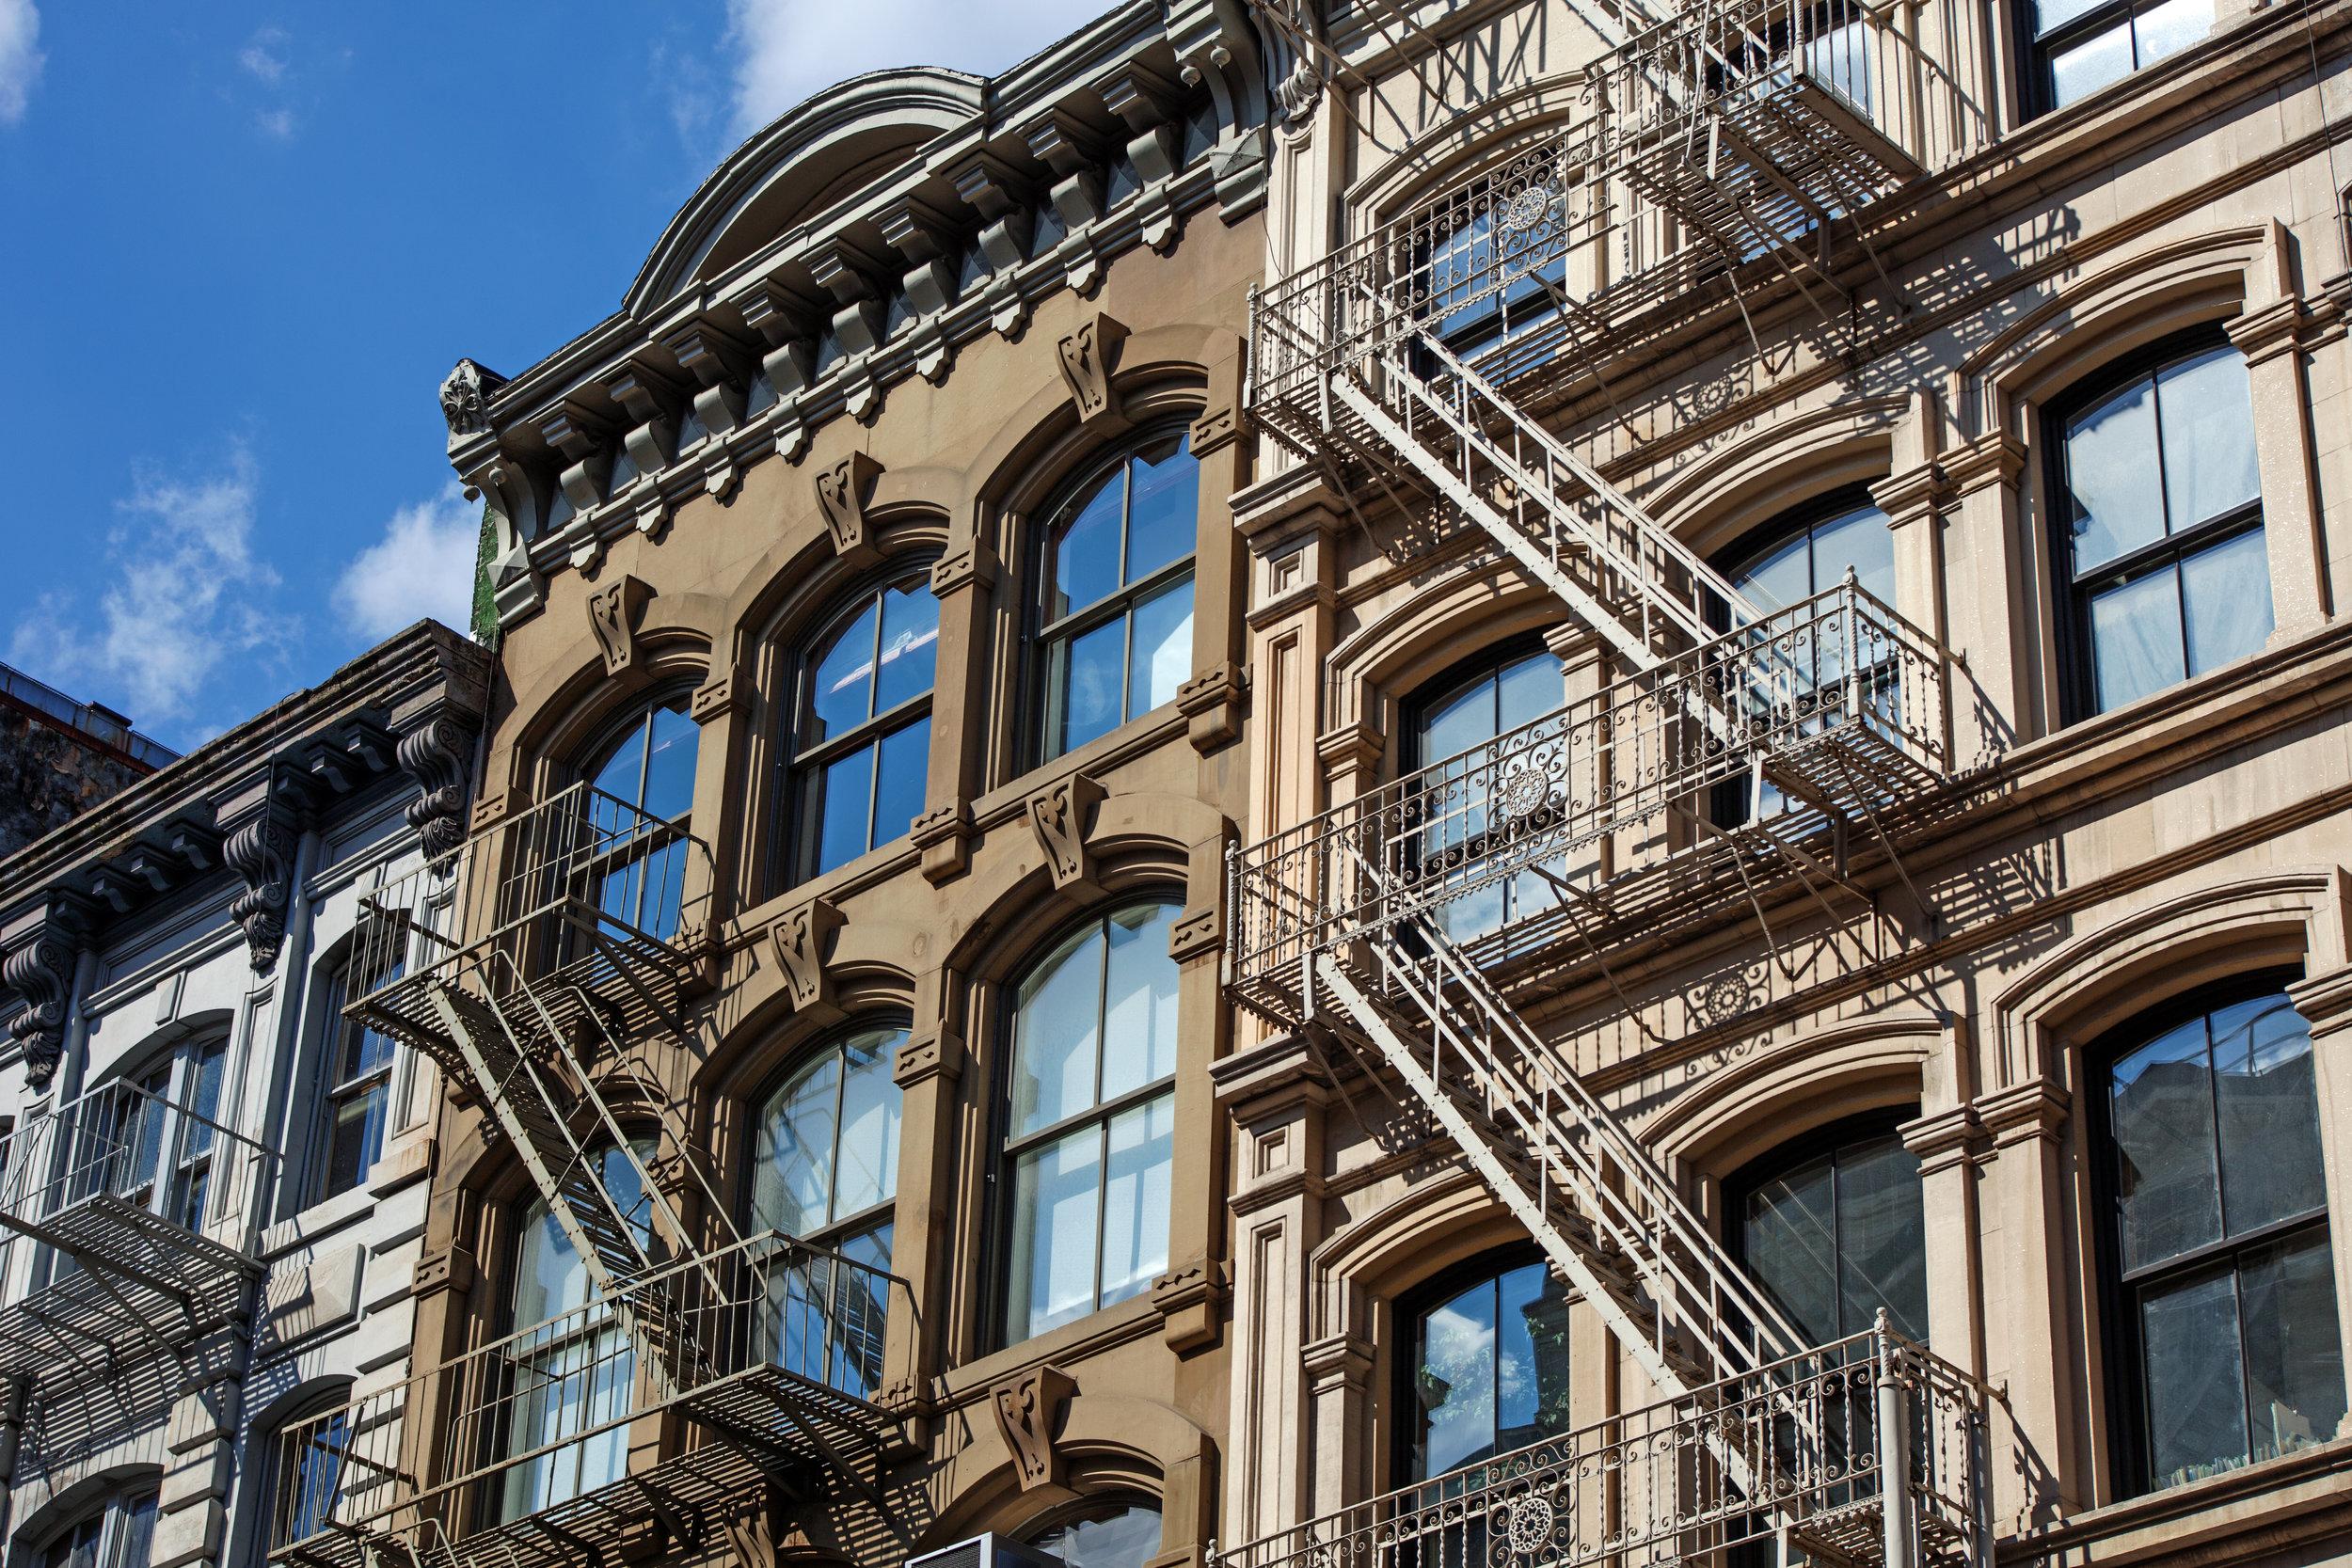 Historic Window Repair and Replacement in Midtown Manhattan